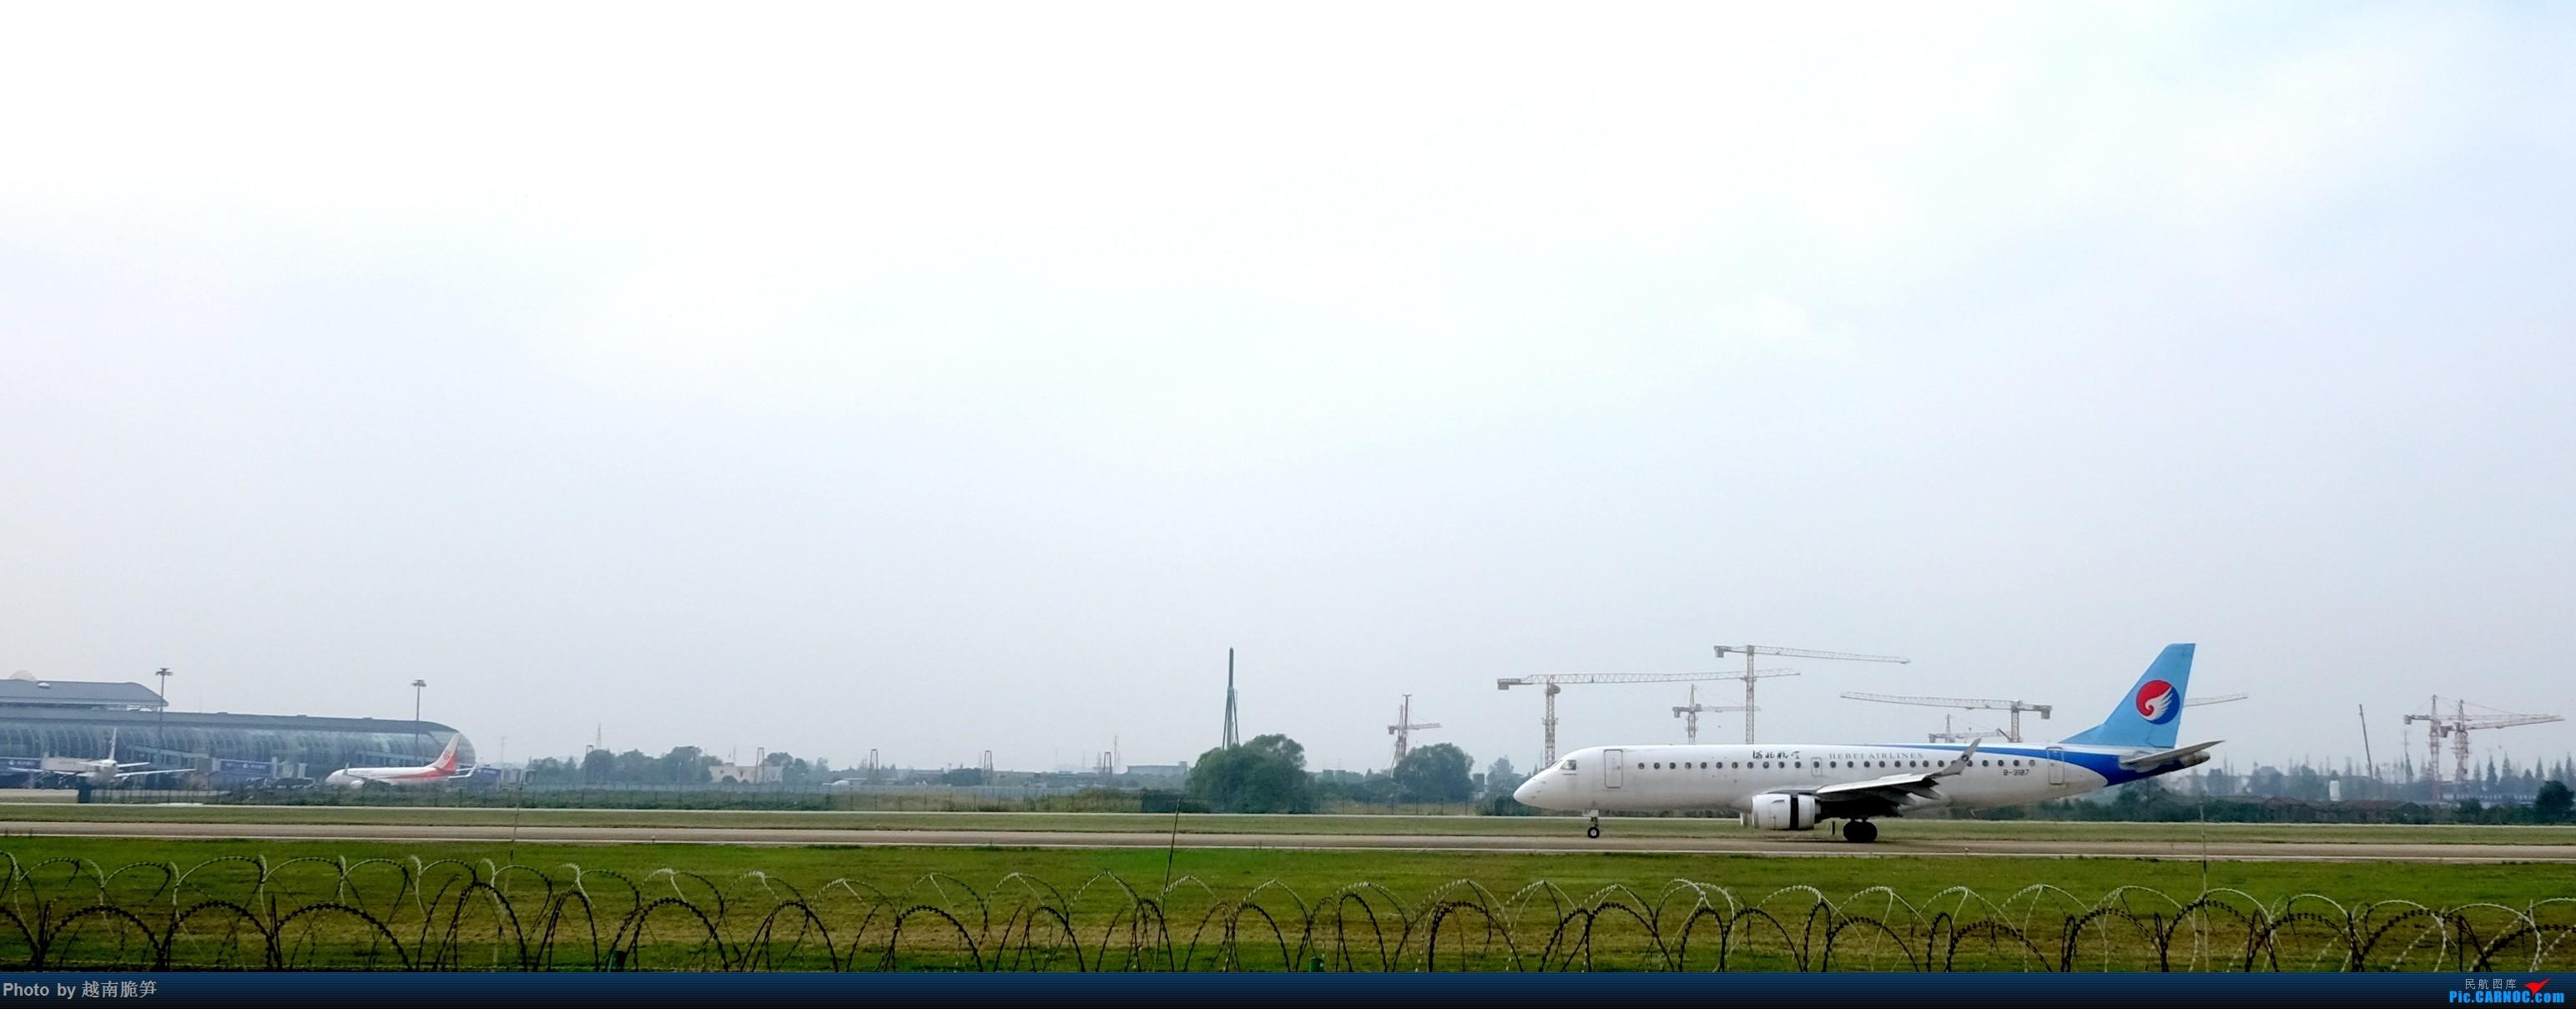 Re:[原创]宁波机场747 EMBRAER 190BJ